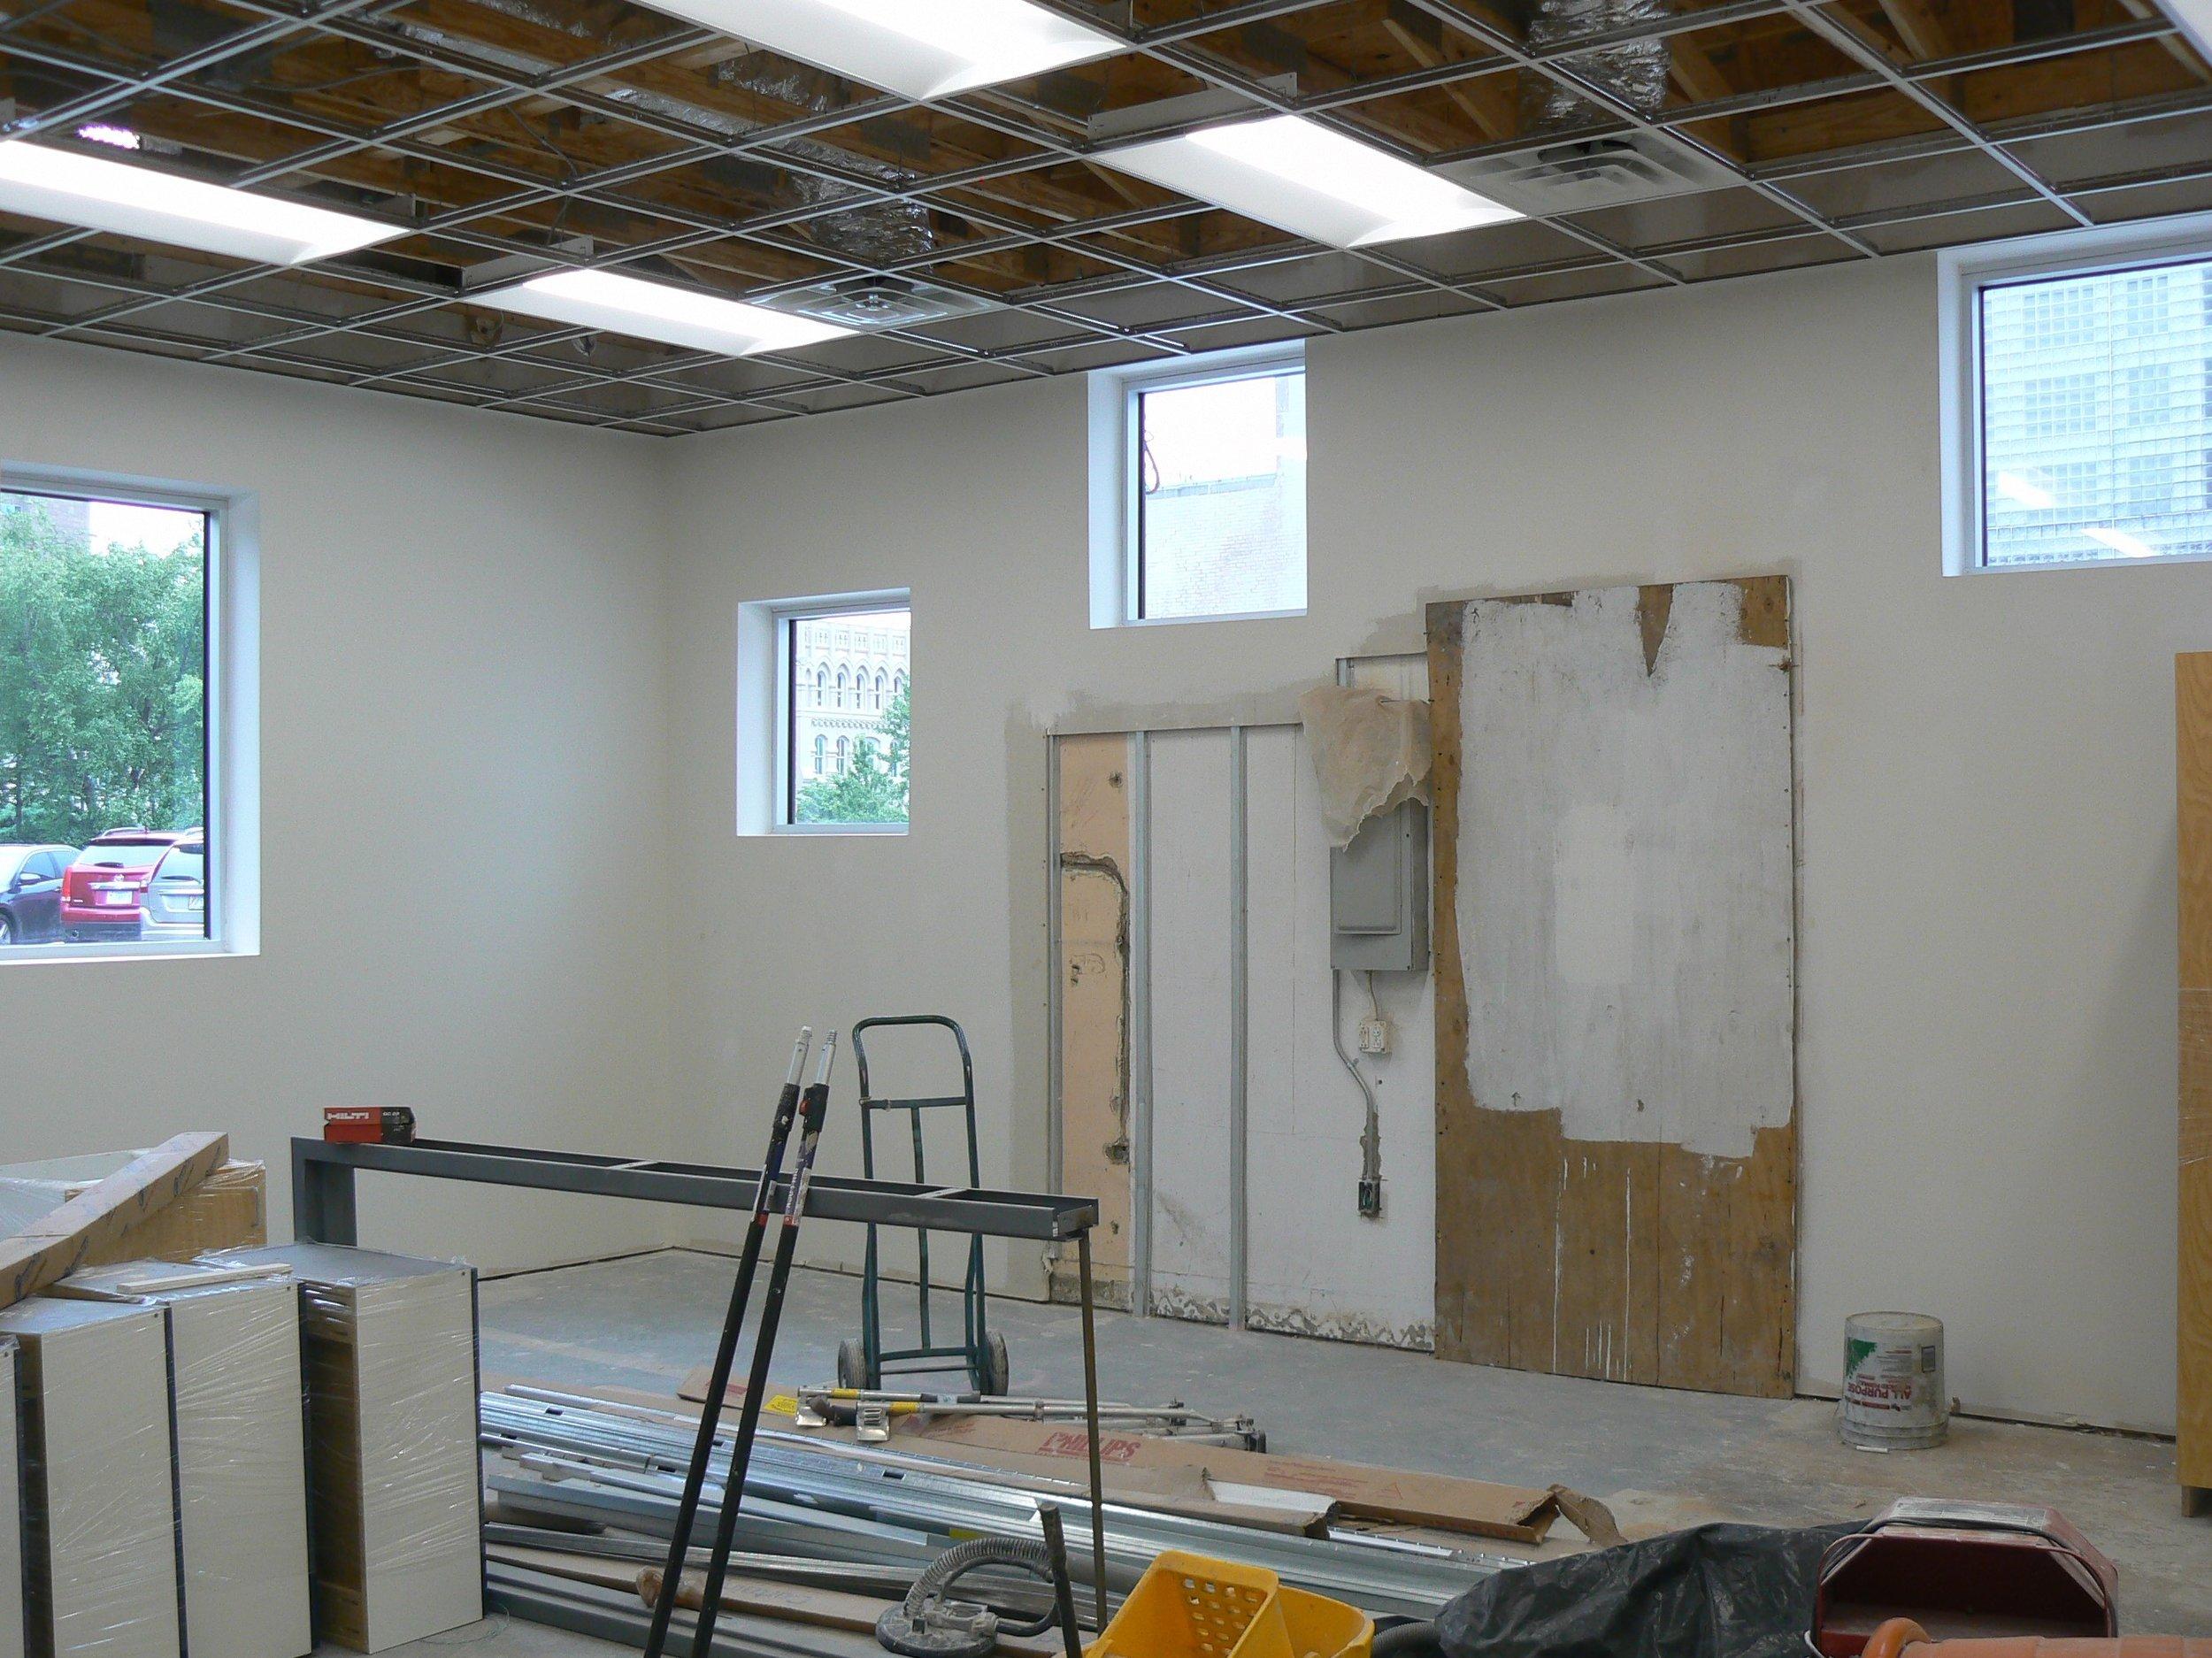 Northeast classroom